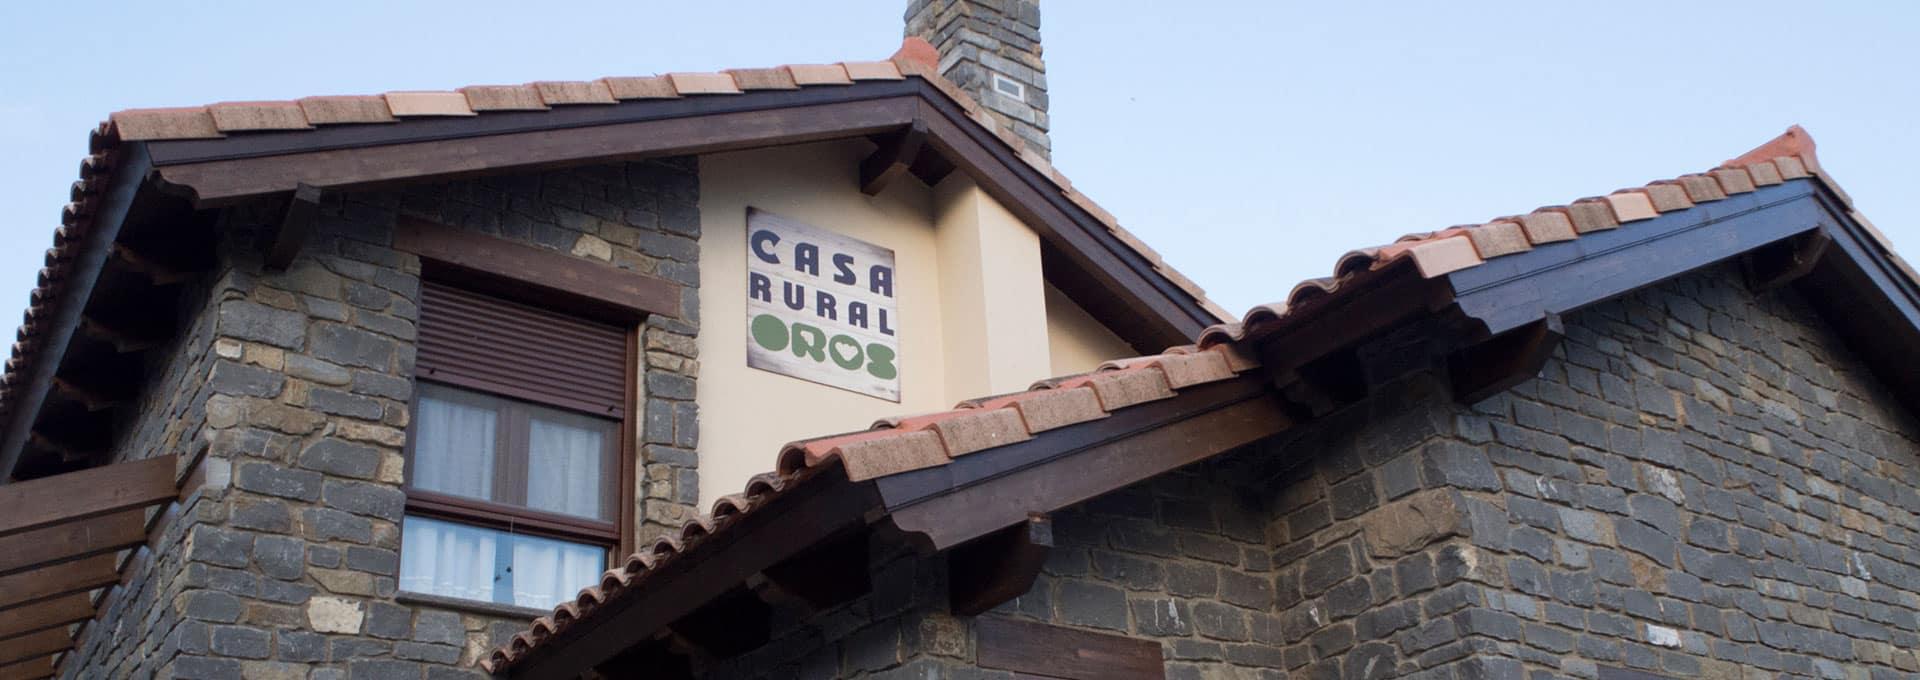 Casa rural Pirineo aragonés turismo activo